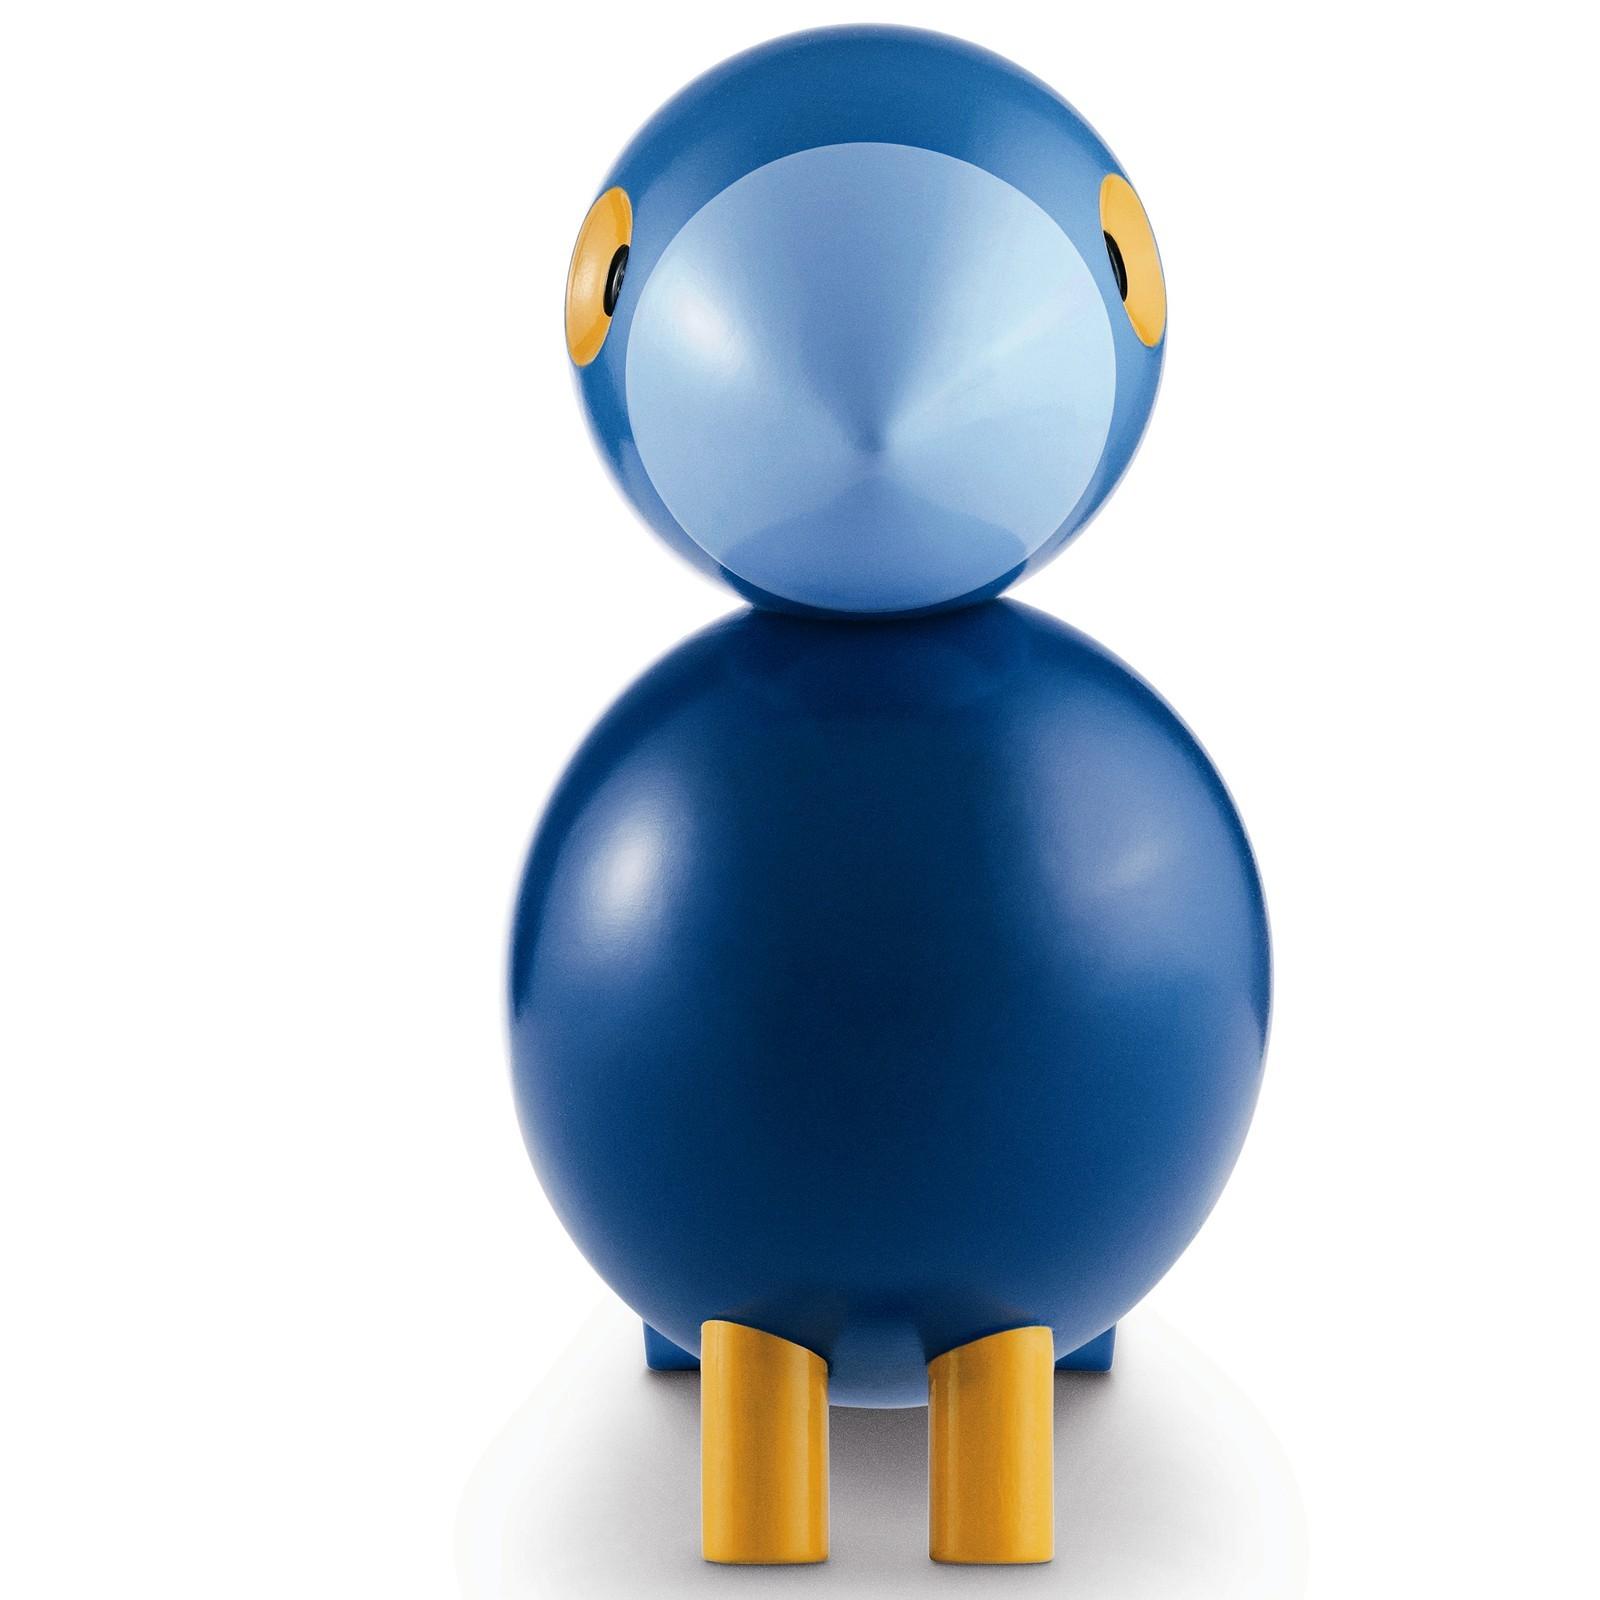 kay bojesen holzfigur singvogel kay buche lackiert blau. Black Bedroom Furniture Sets. Home Design Ideas